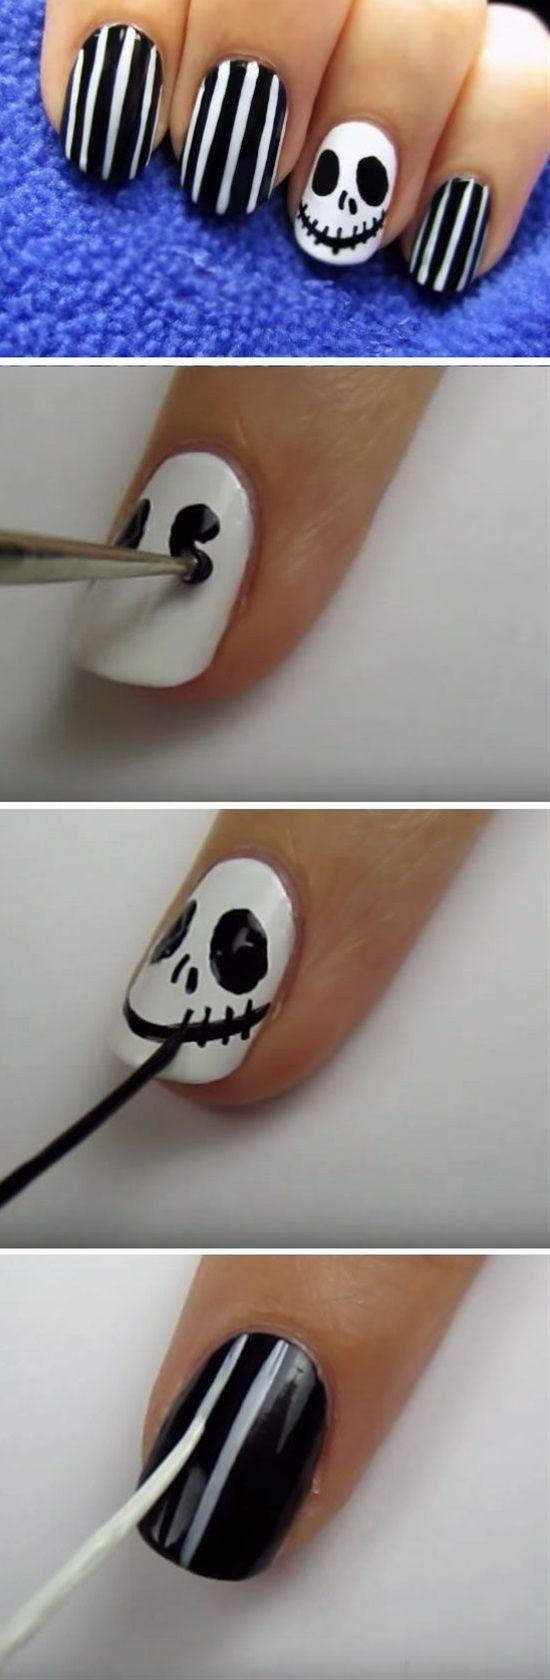 15 Spooky and Creative Halloween Nail Art Design Ideas | Postris